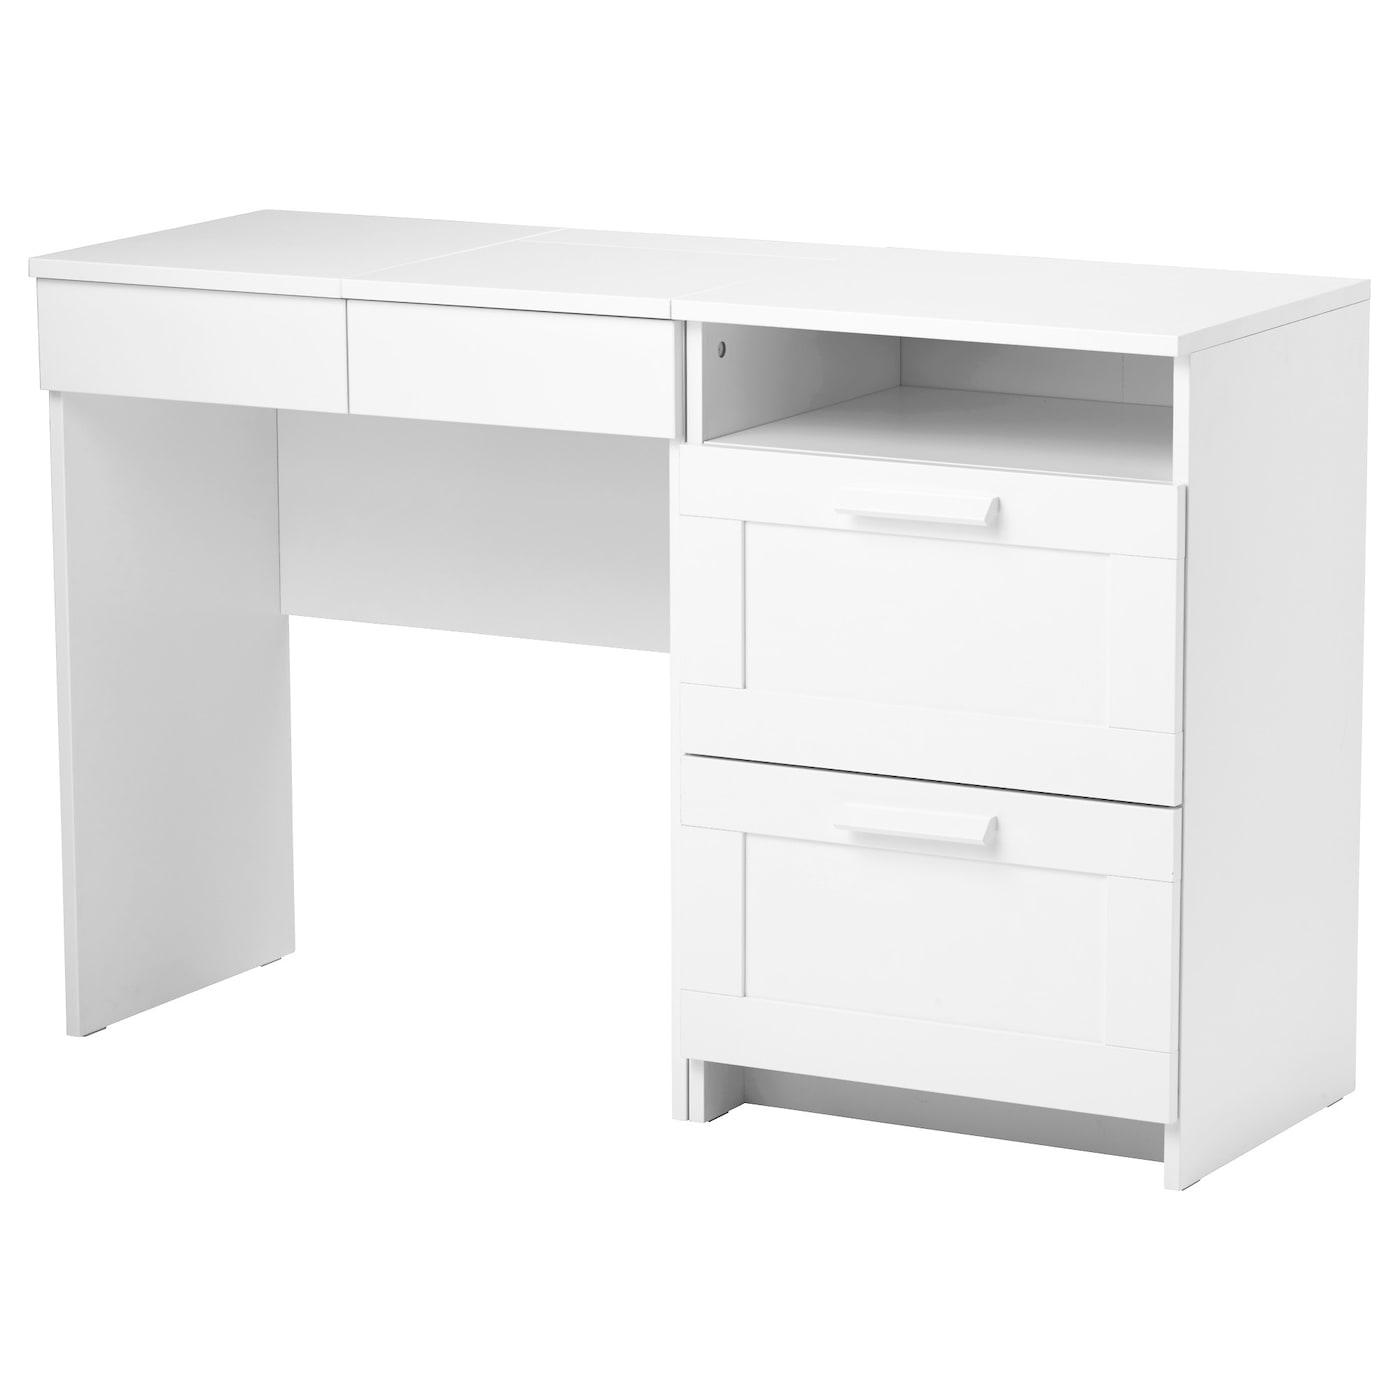 BRIMNES Toilettafel en ladekast 2 lades Wit IKEA